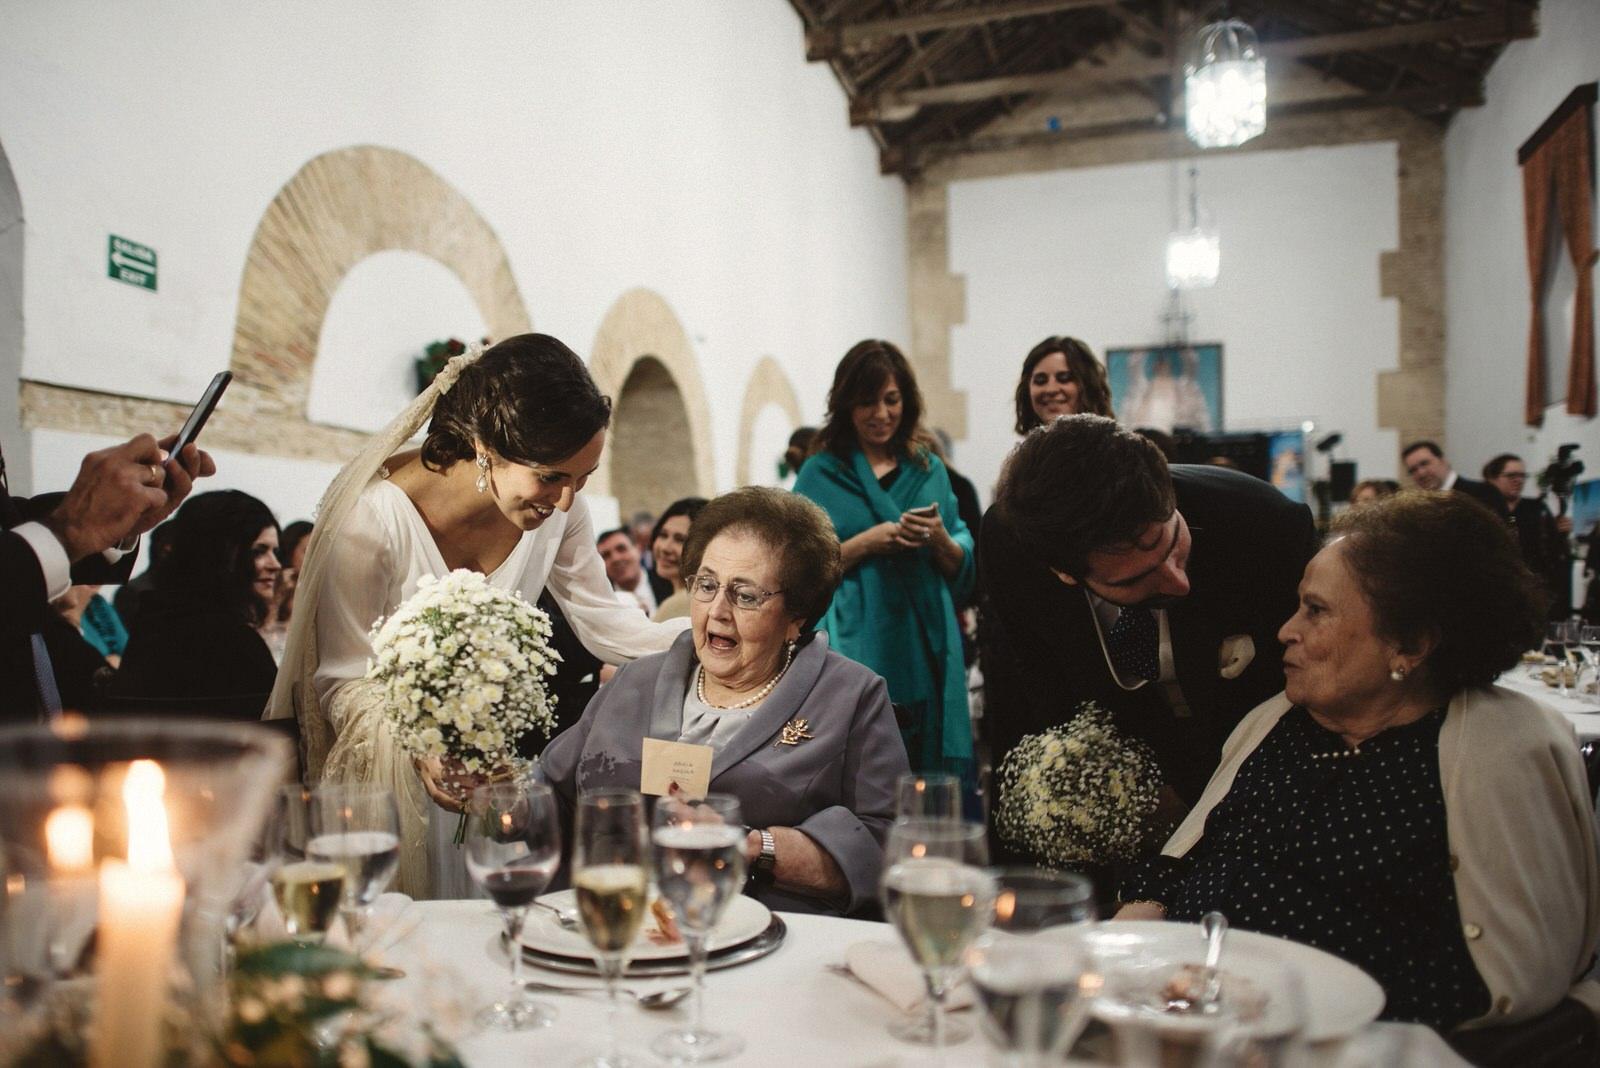 fotografo de bodas sevilla - fotografo boda - fotografía sevilla - Andrés AmarilloAAA_3577- fine.JPG